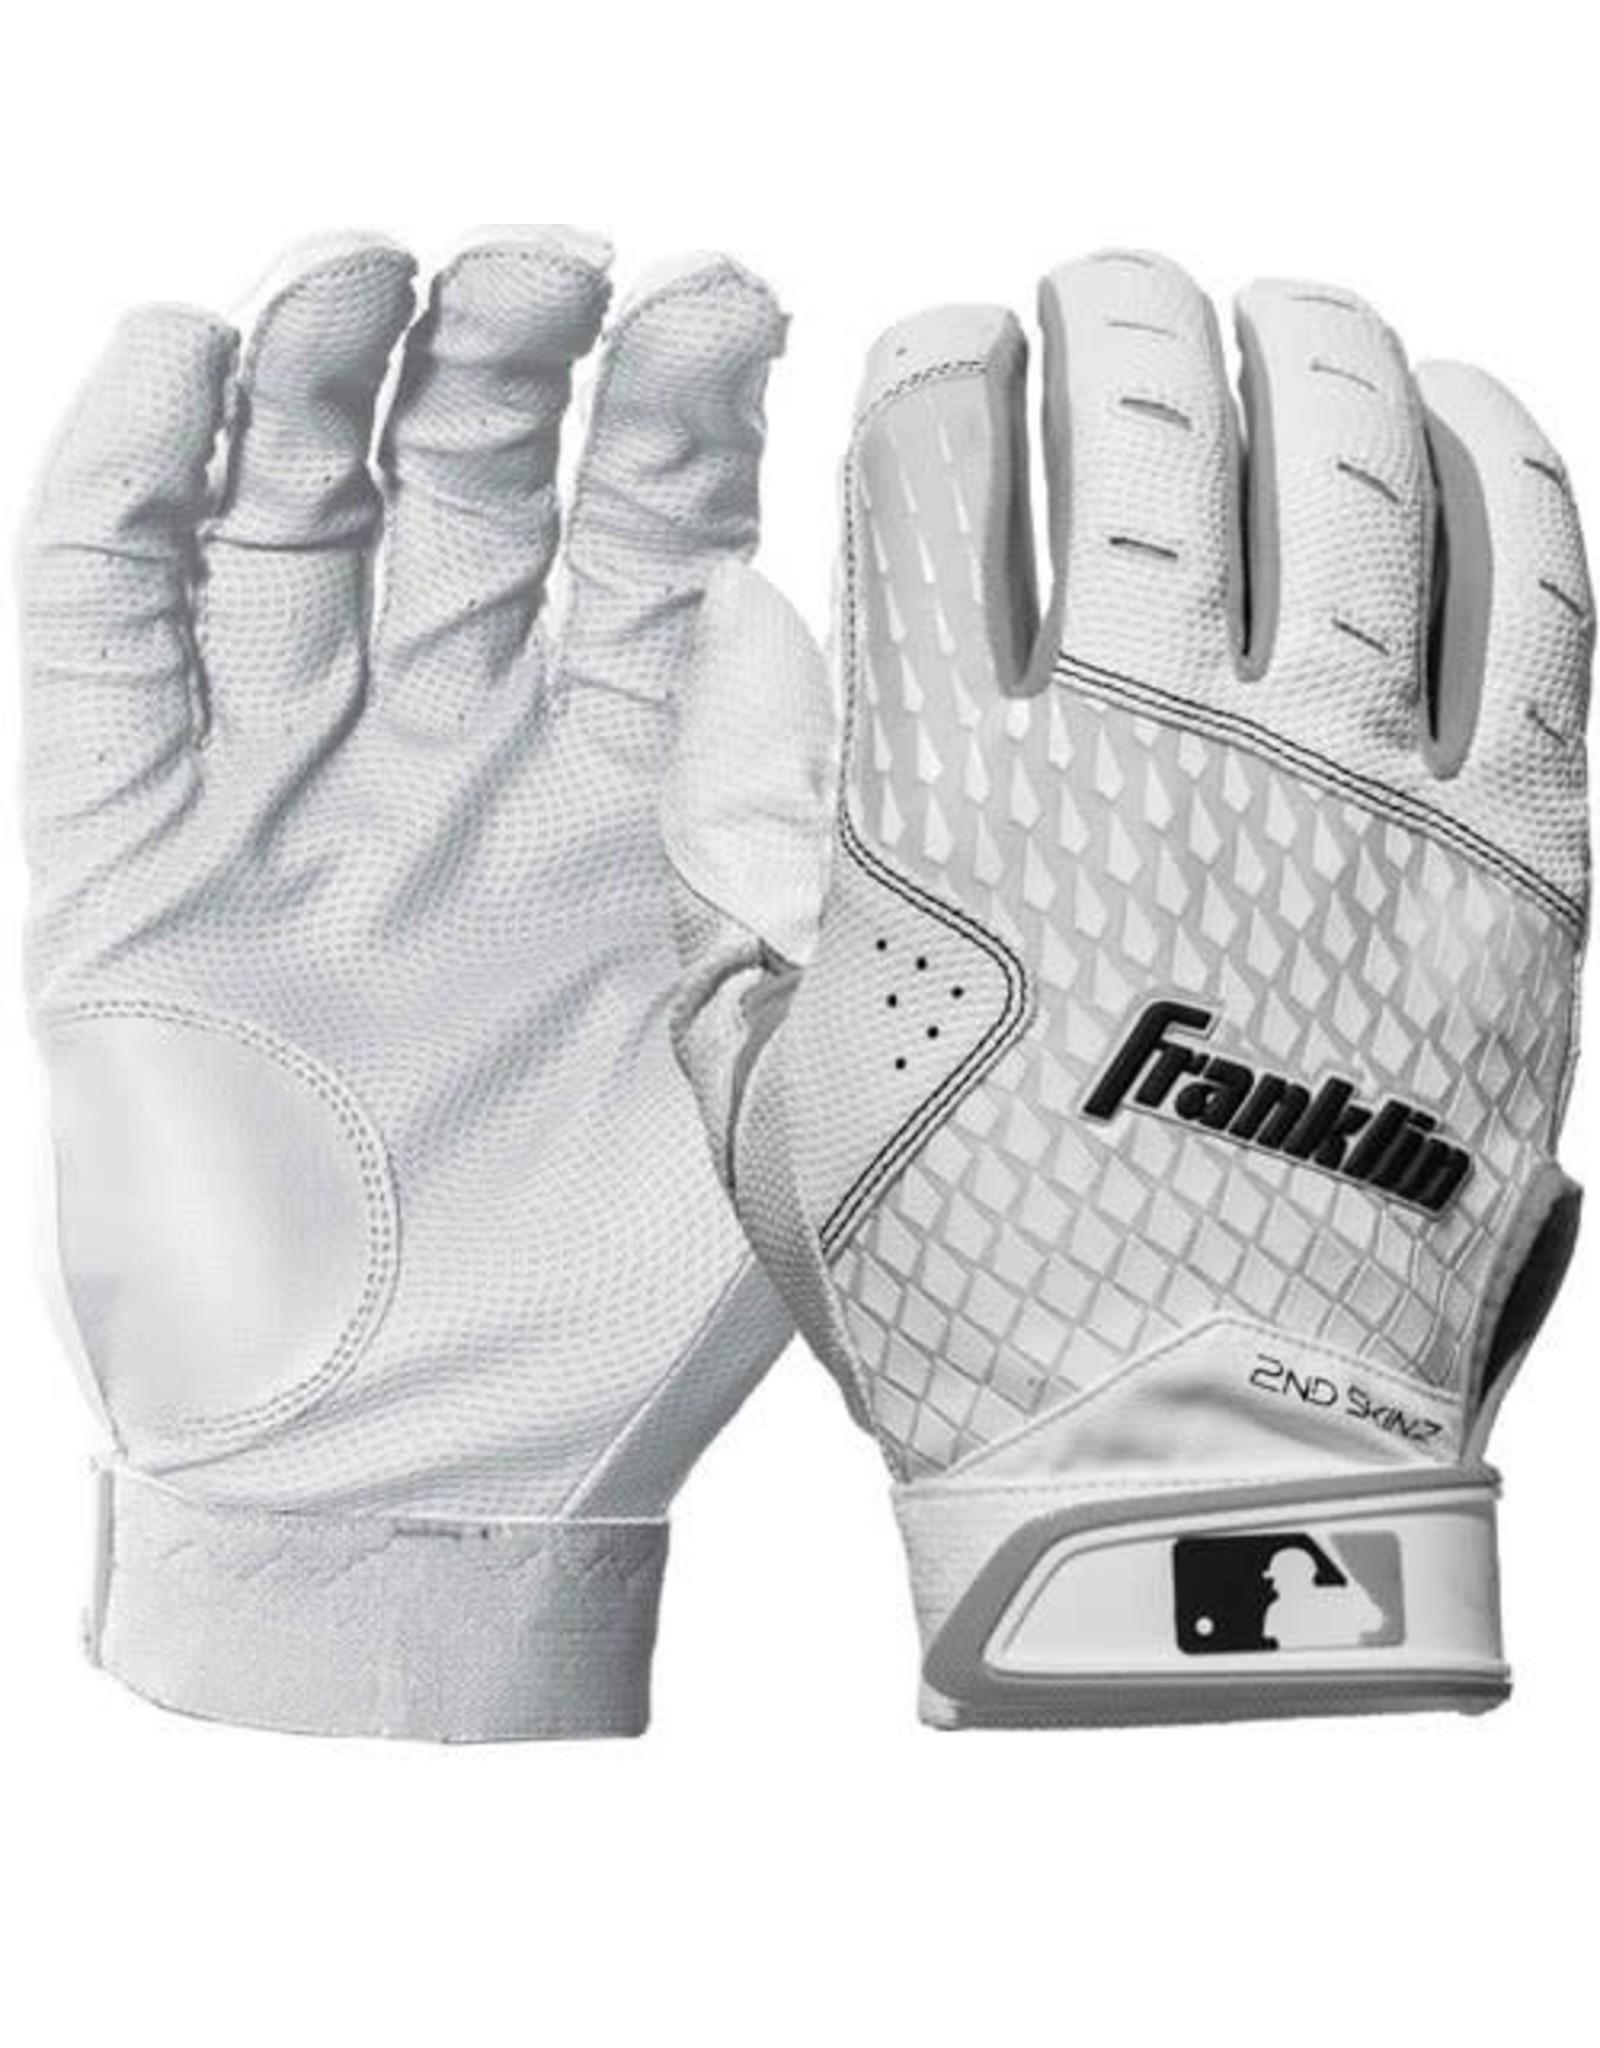 Franklin Franklin Batting Glove 2ND SKIN -JEUNE YOUTH-